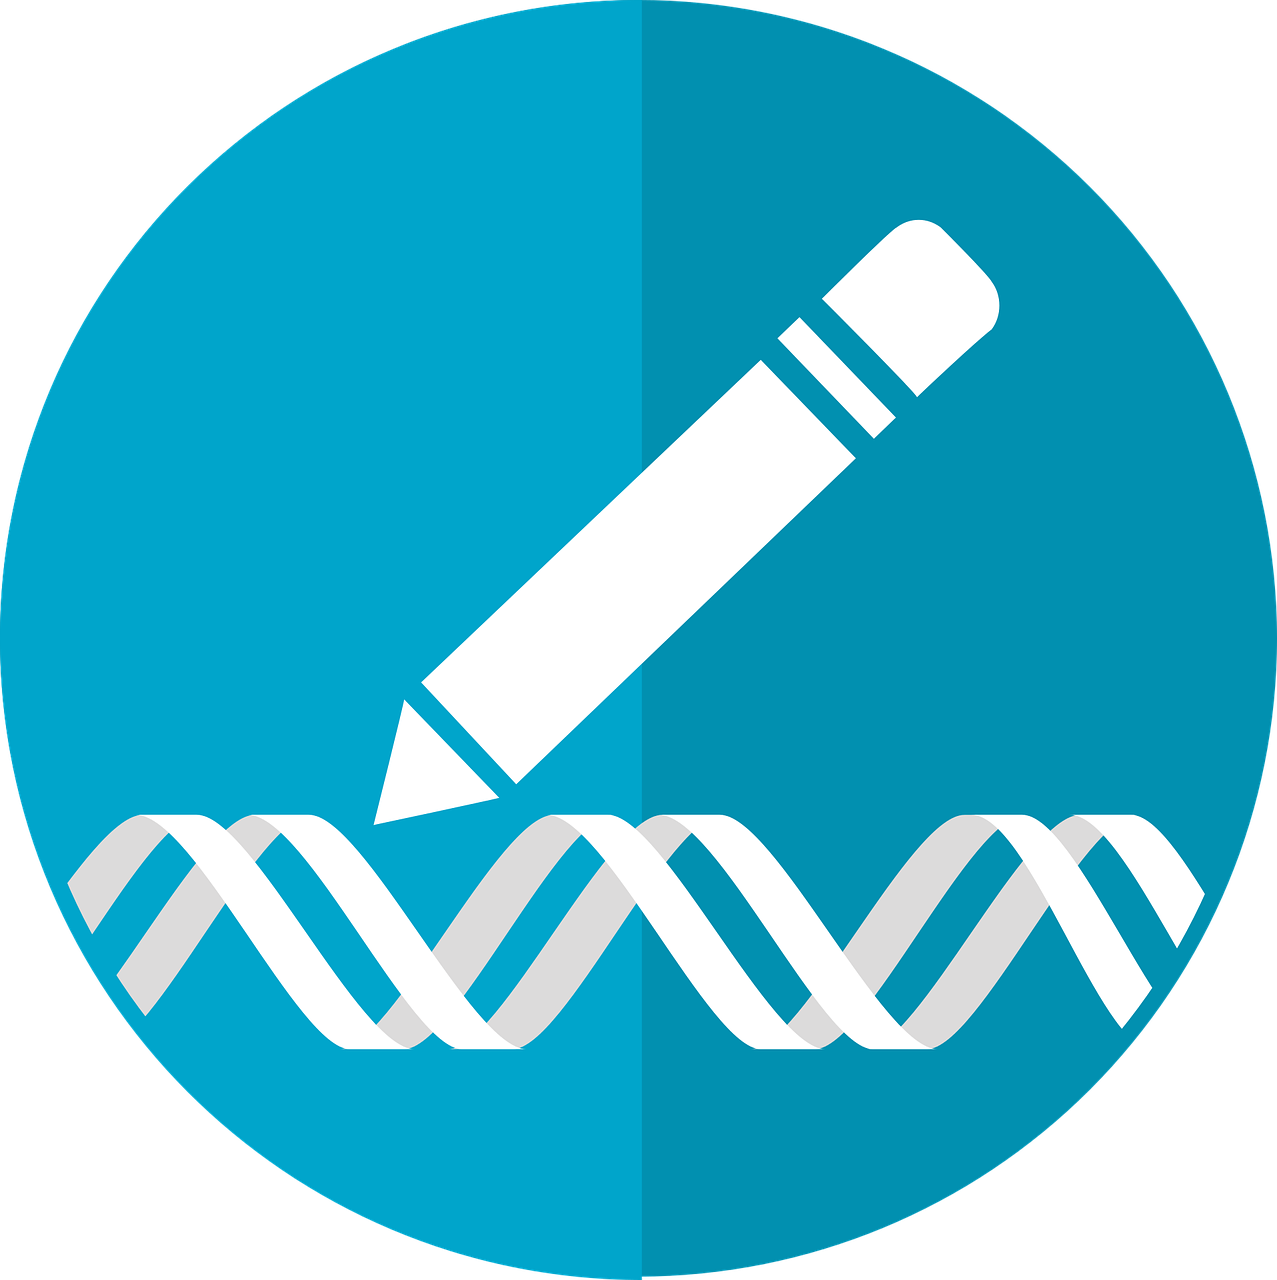 Genome editing metaphors and. Dna clipart epigenetics